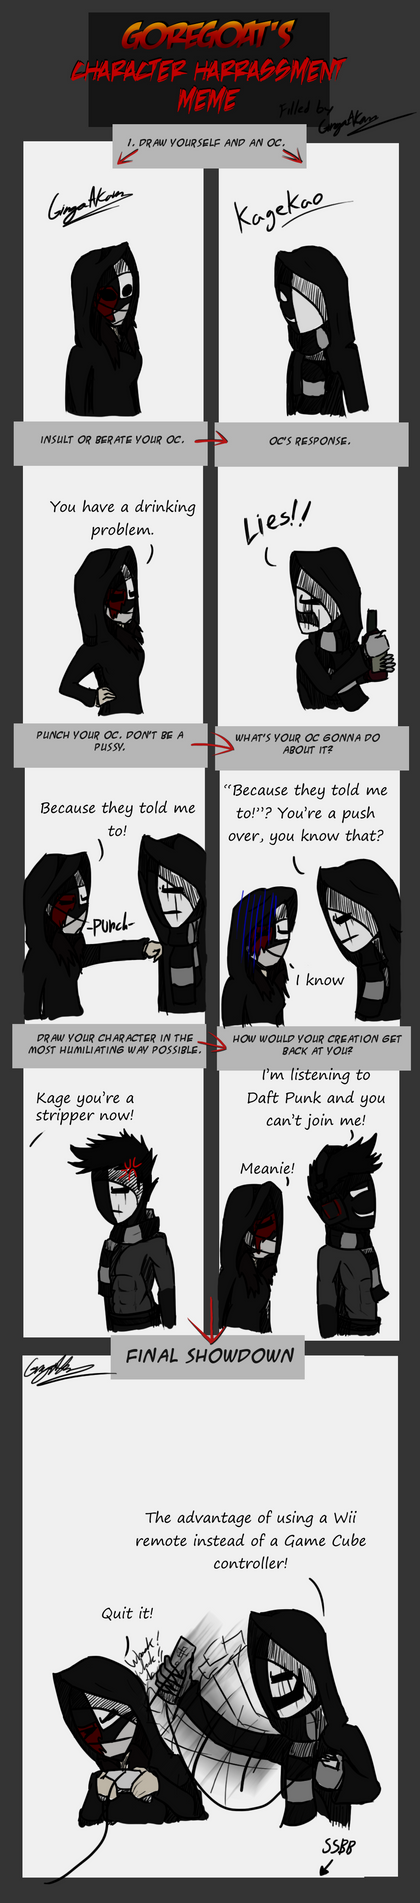 Character harassment meme - Kagekao by GingaAkam